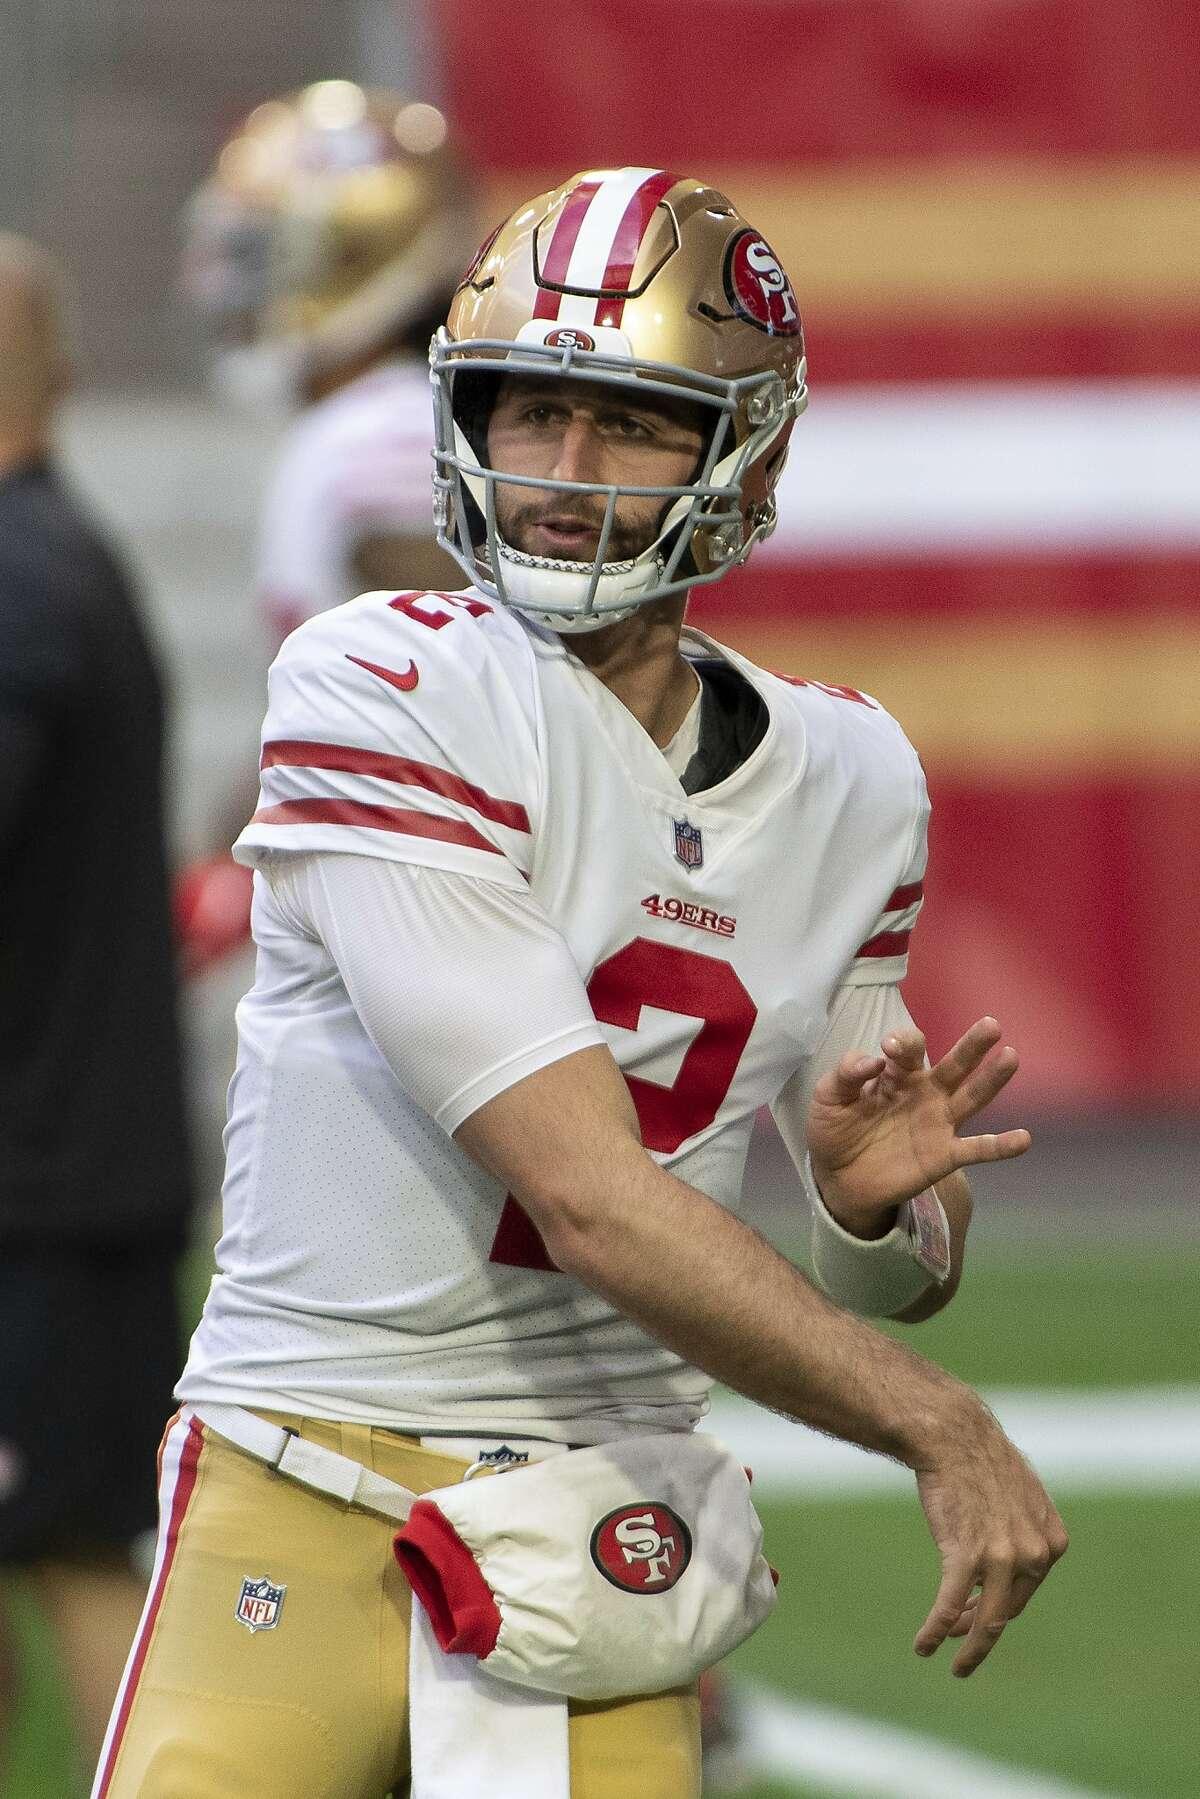 San Francisco 49ers quarterback Josh Rosen warms prior to the regular-season finale against the Seahawks. San Francisco is Rosen's fourth NFL team in three seasons.